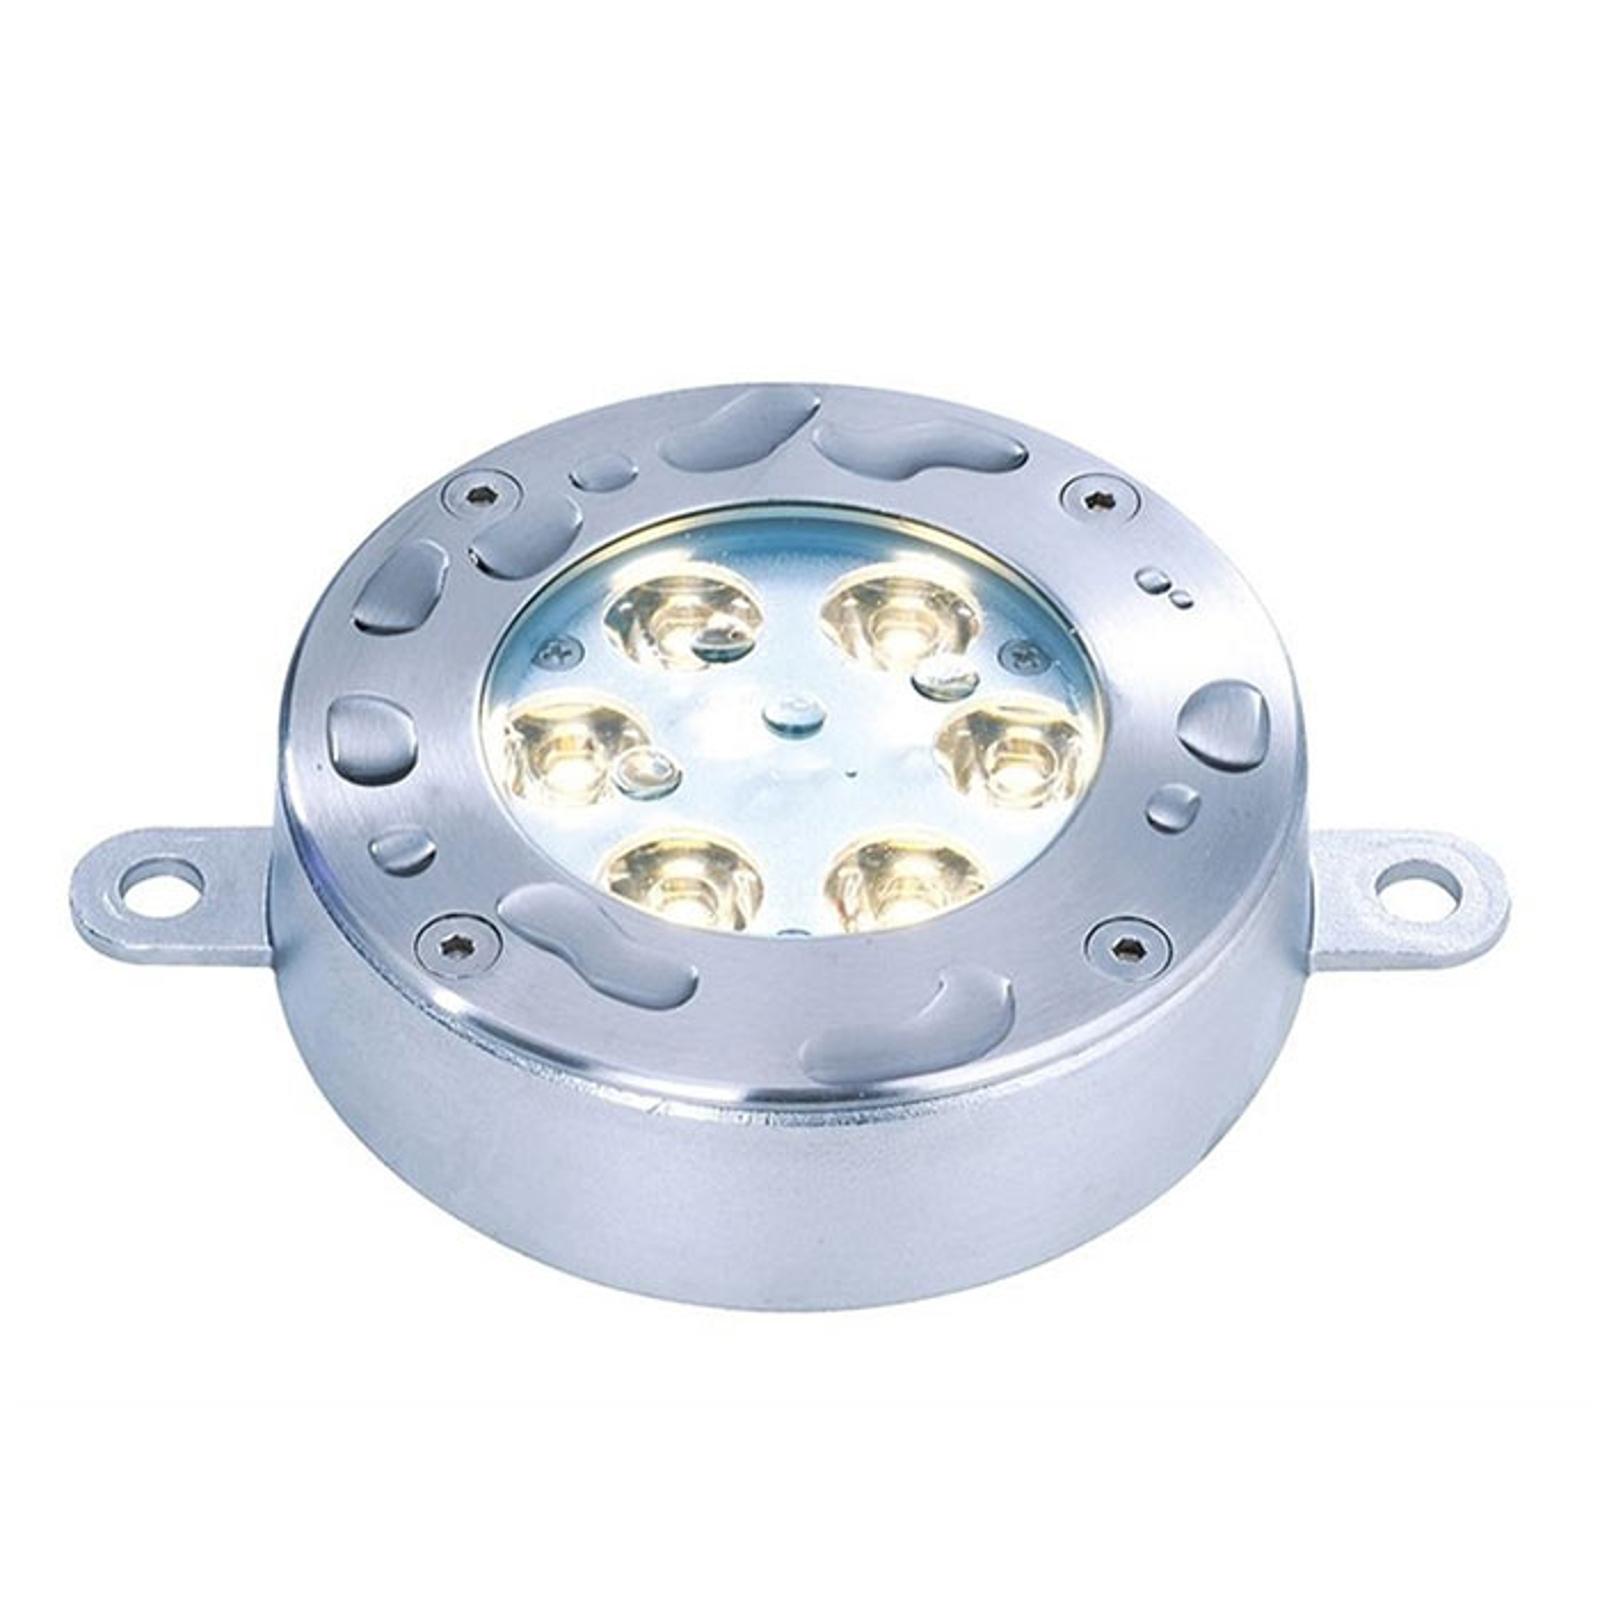 Podvodné zapustené podlahové LED, teplá biela_2501768_1